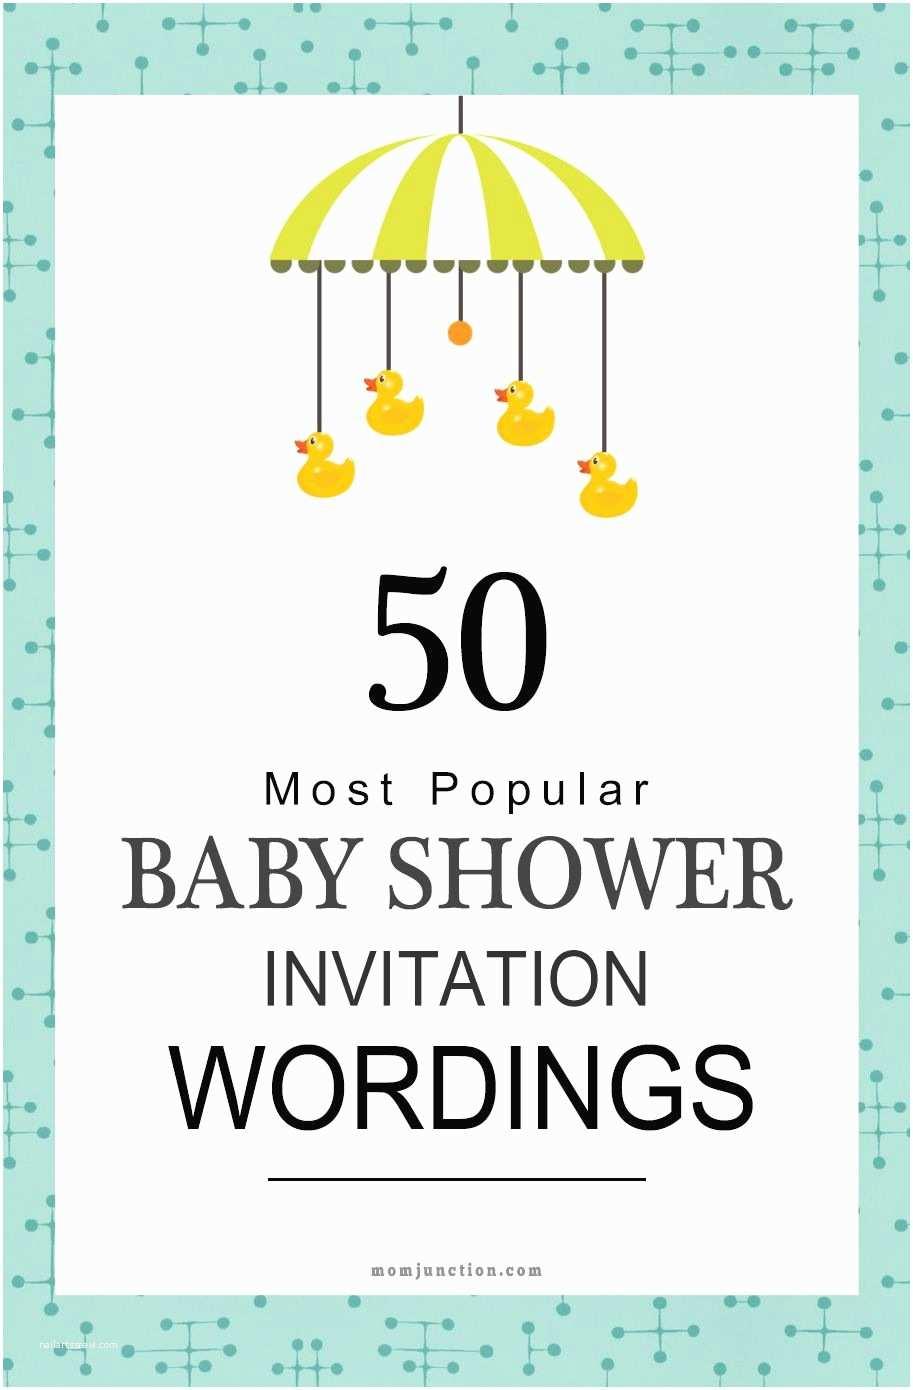 Baby Shower Invitations Wording 75 Most Popular Baby Shower Invitation Wordings